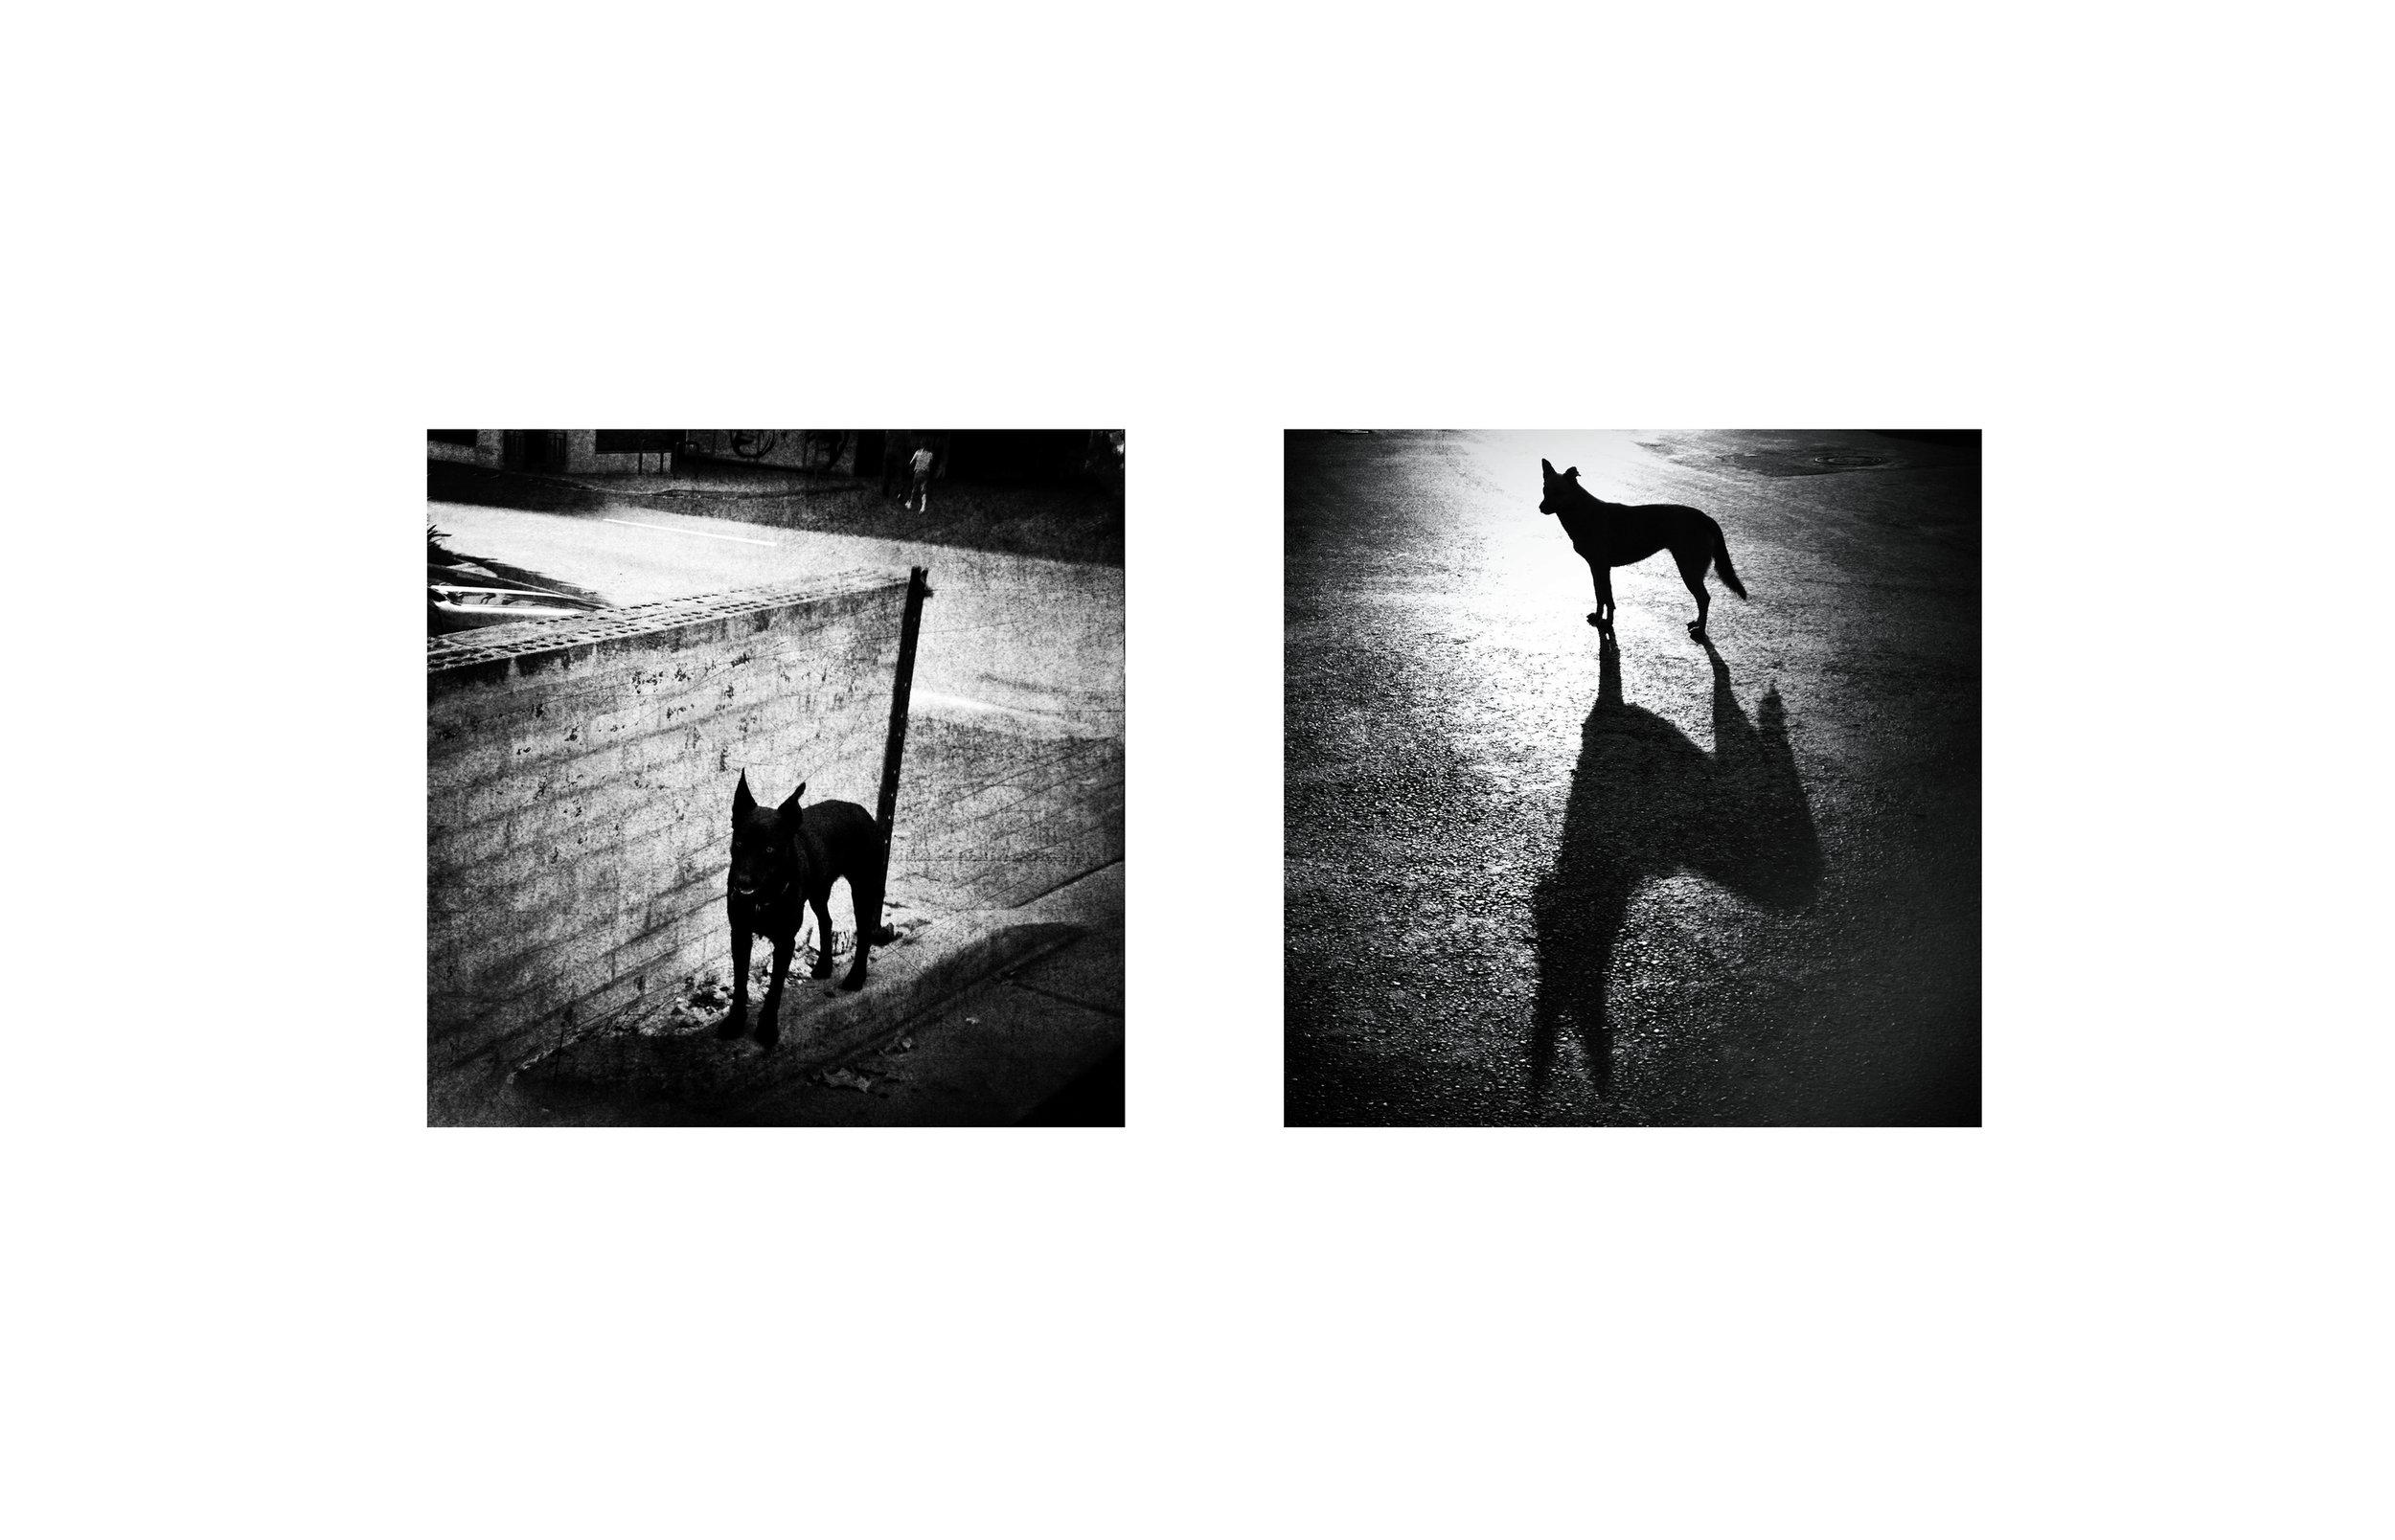 Mirrored_Andersen_Suyabatmaz4.jpg